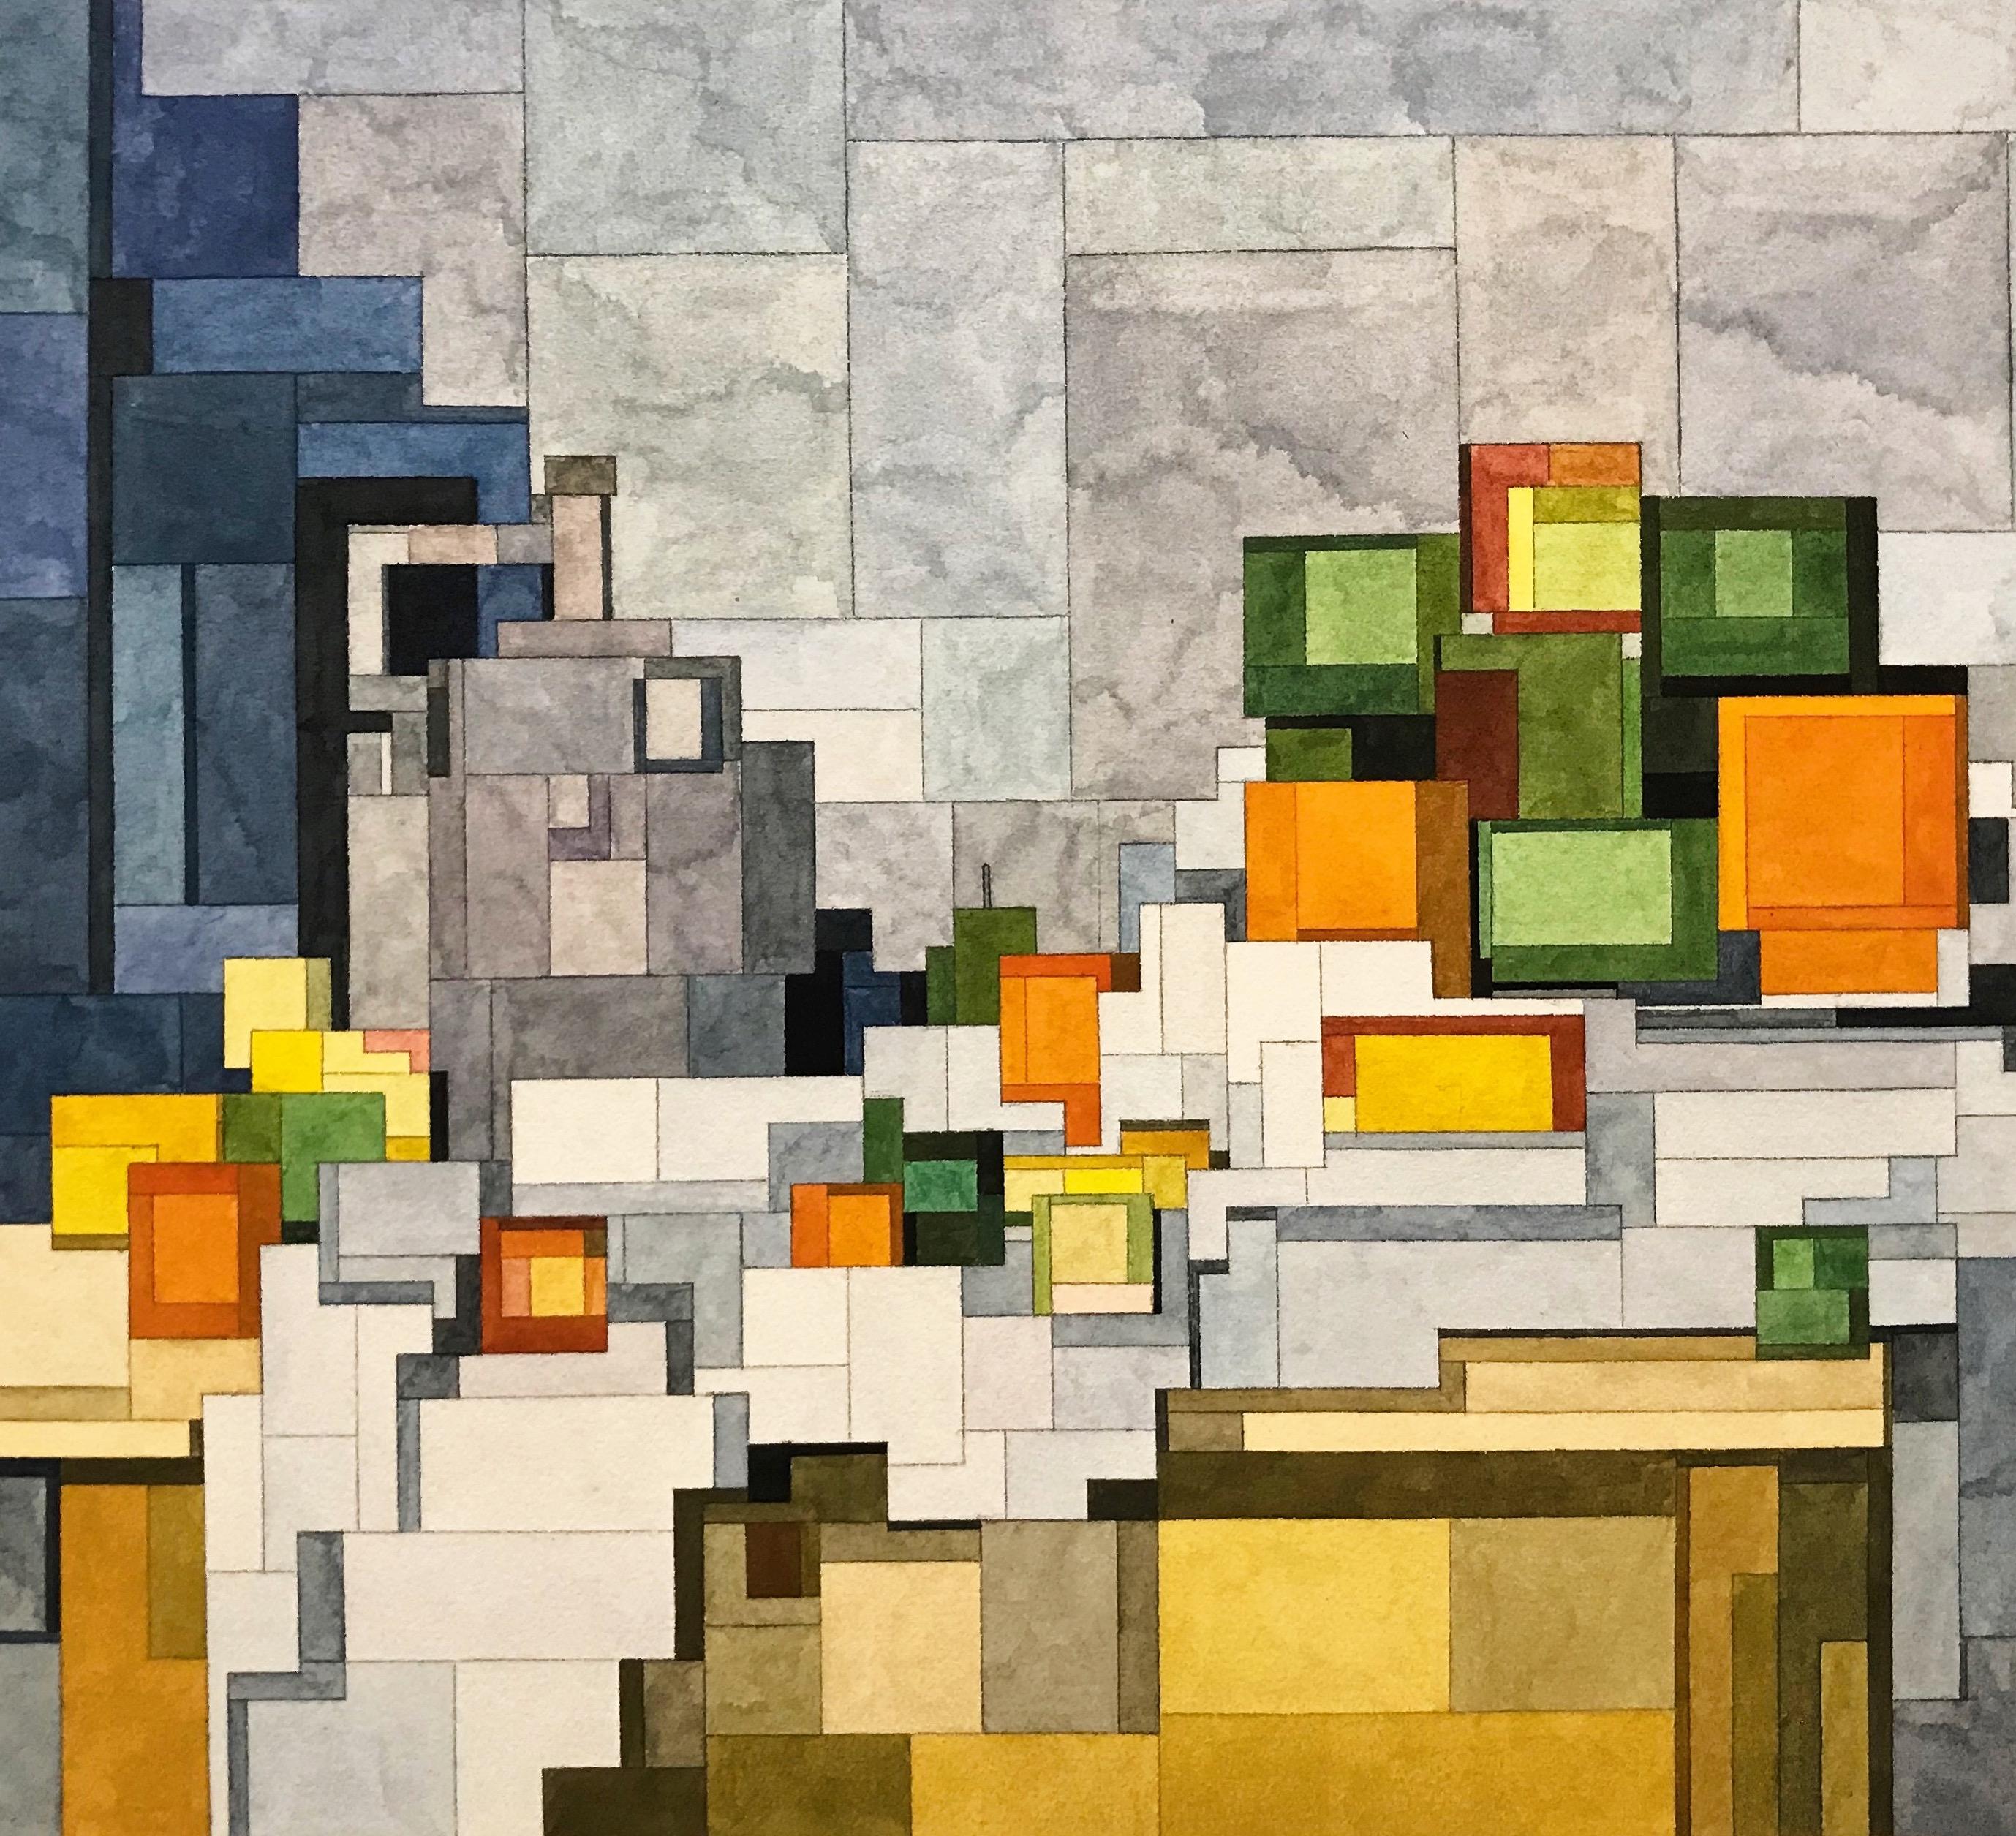 Lister – Cezanne still life